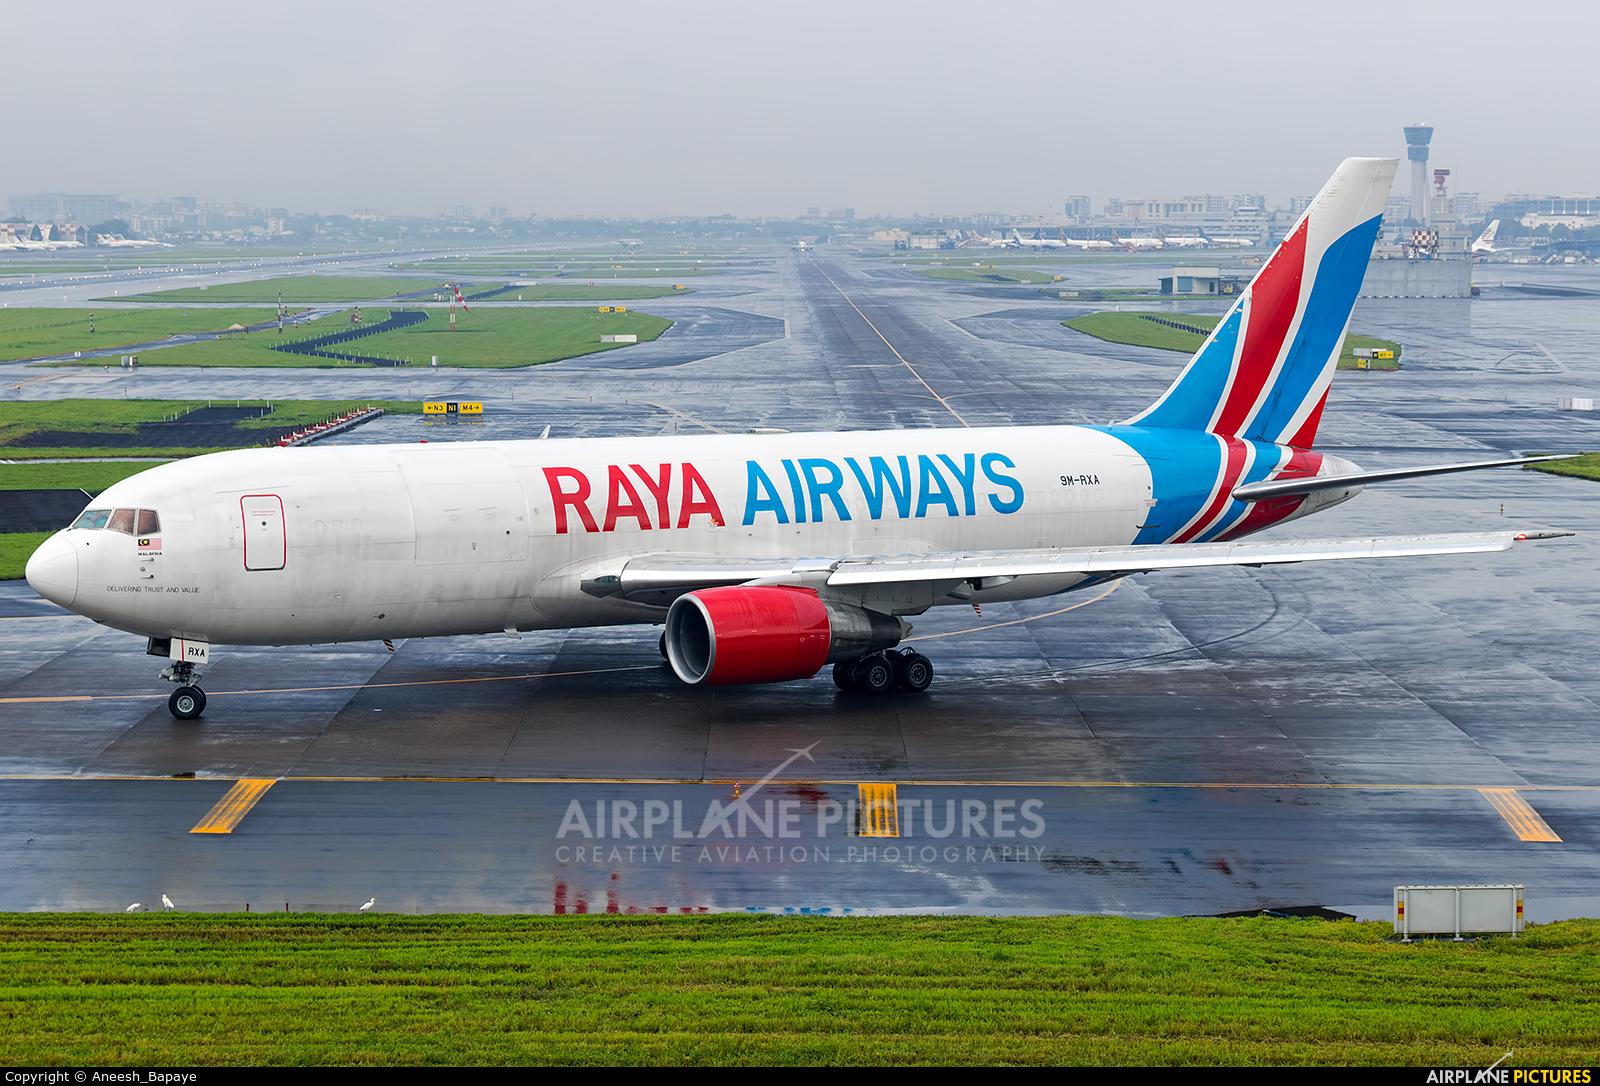 Raya Airways 9M-RXA aircraft at Mumbai - Chhatrapati Shivaji Intl